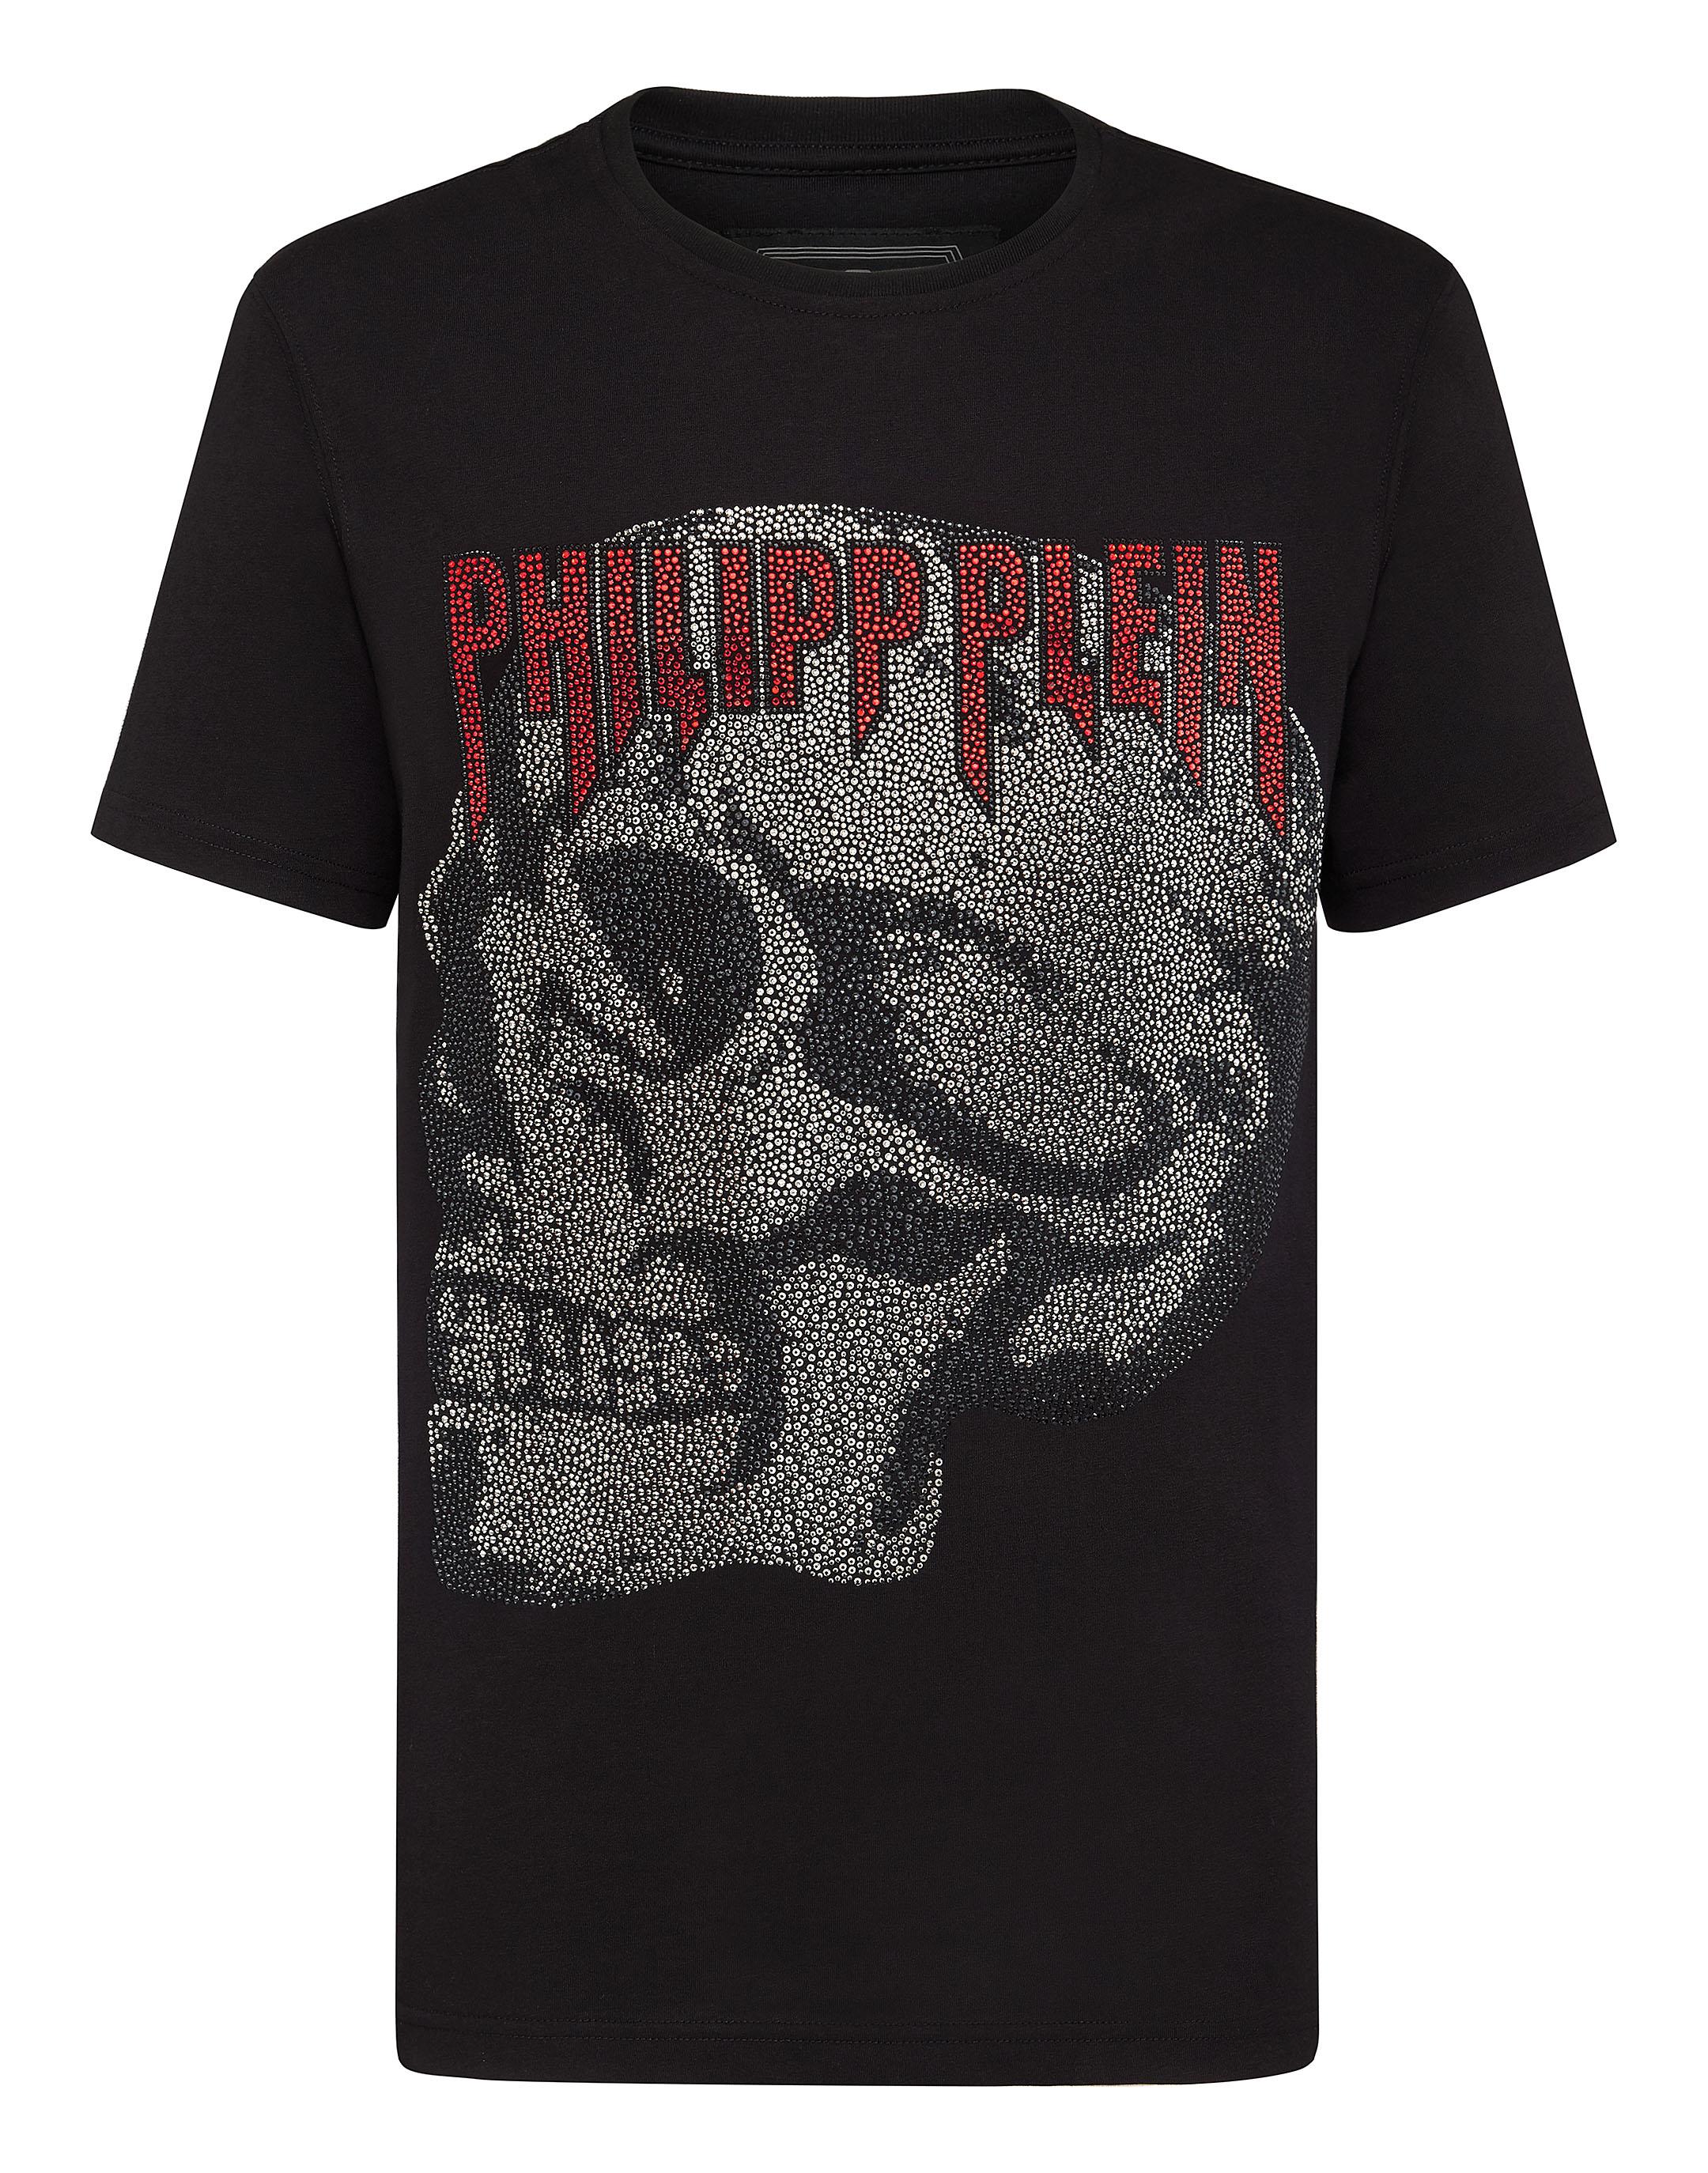 9ab3d39cc66 T-shirt Platinum Cut Round Neck Stars and skull | Philipp Plein